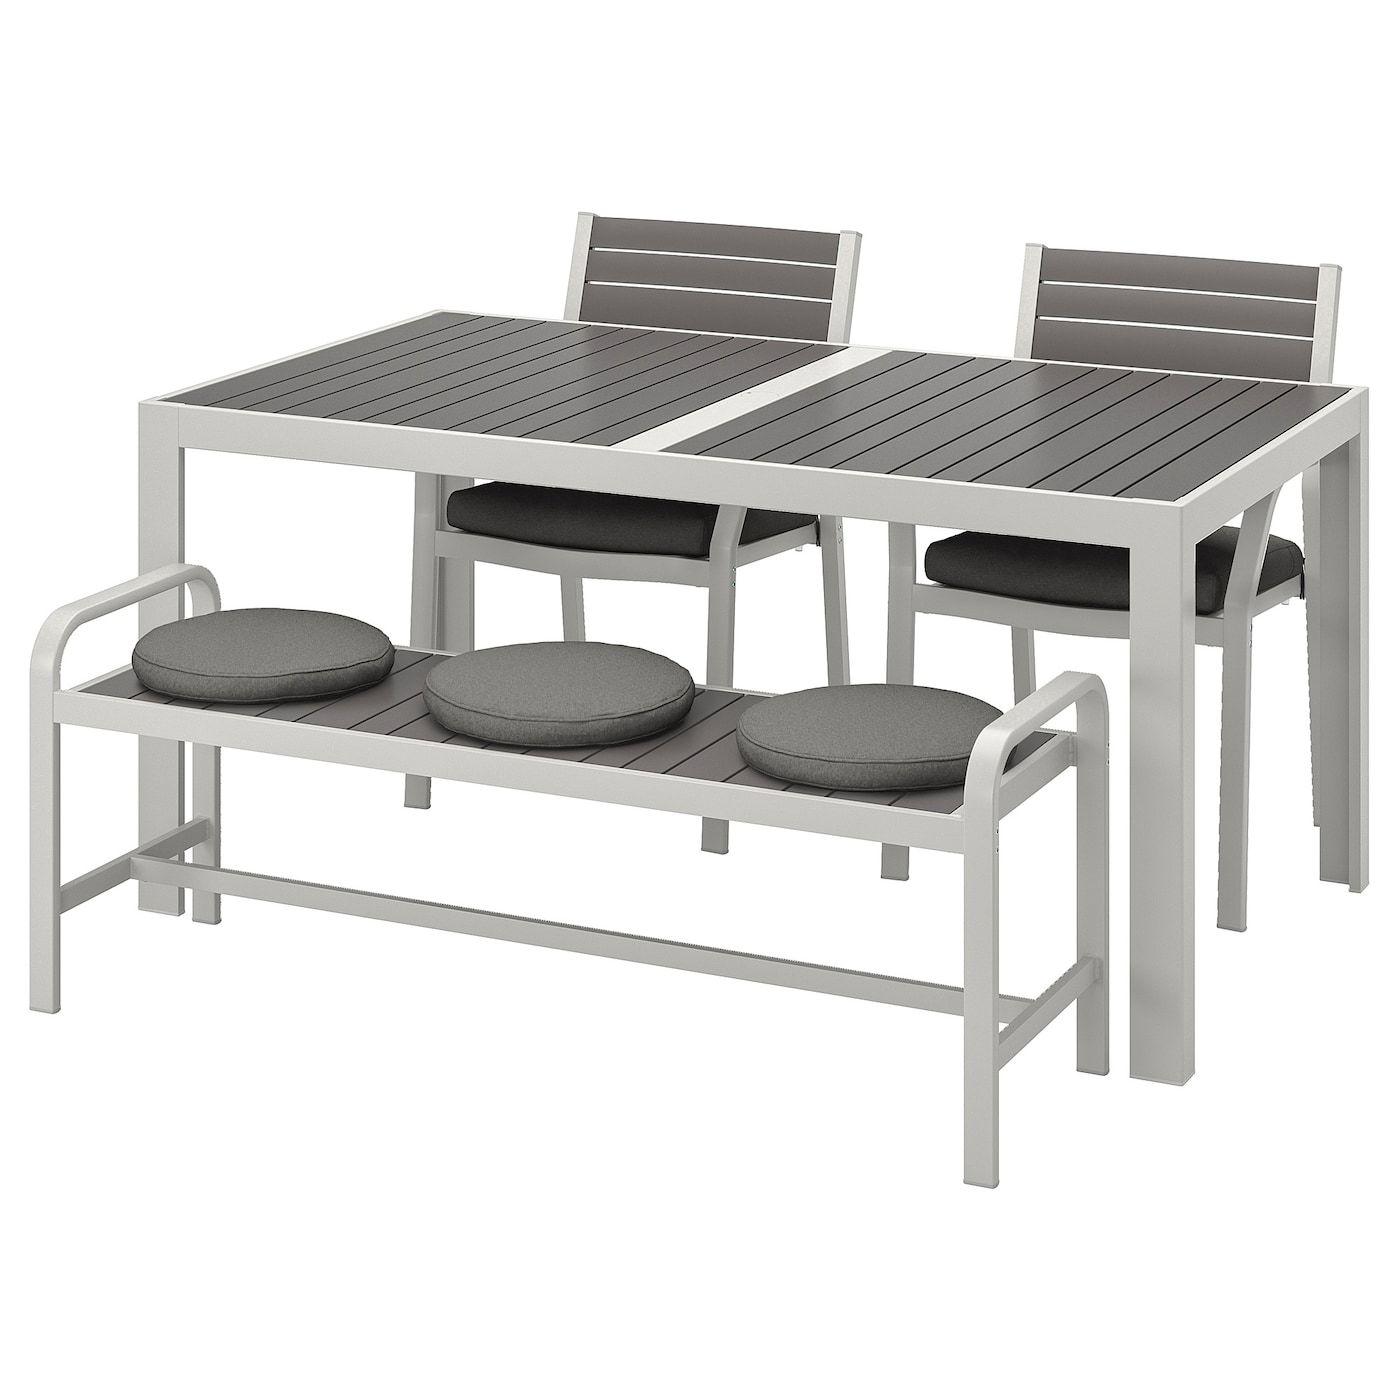 Sjalland Tisch 2 Stuhle Bank Aussen Dunkelgrau Froson Duvholmen